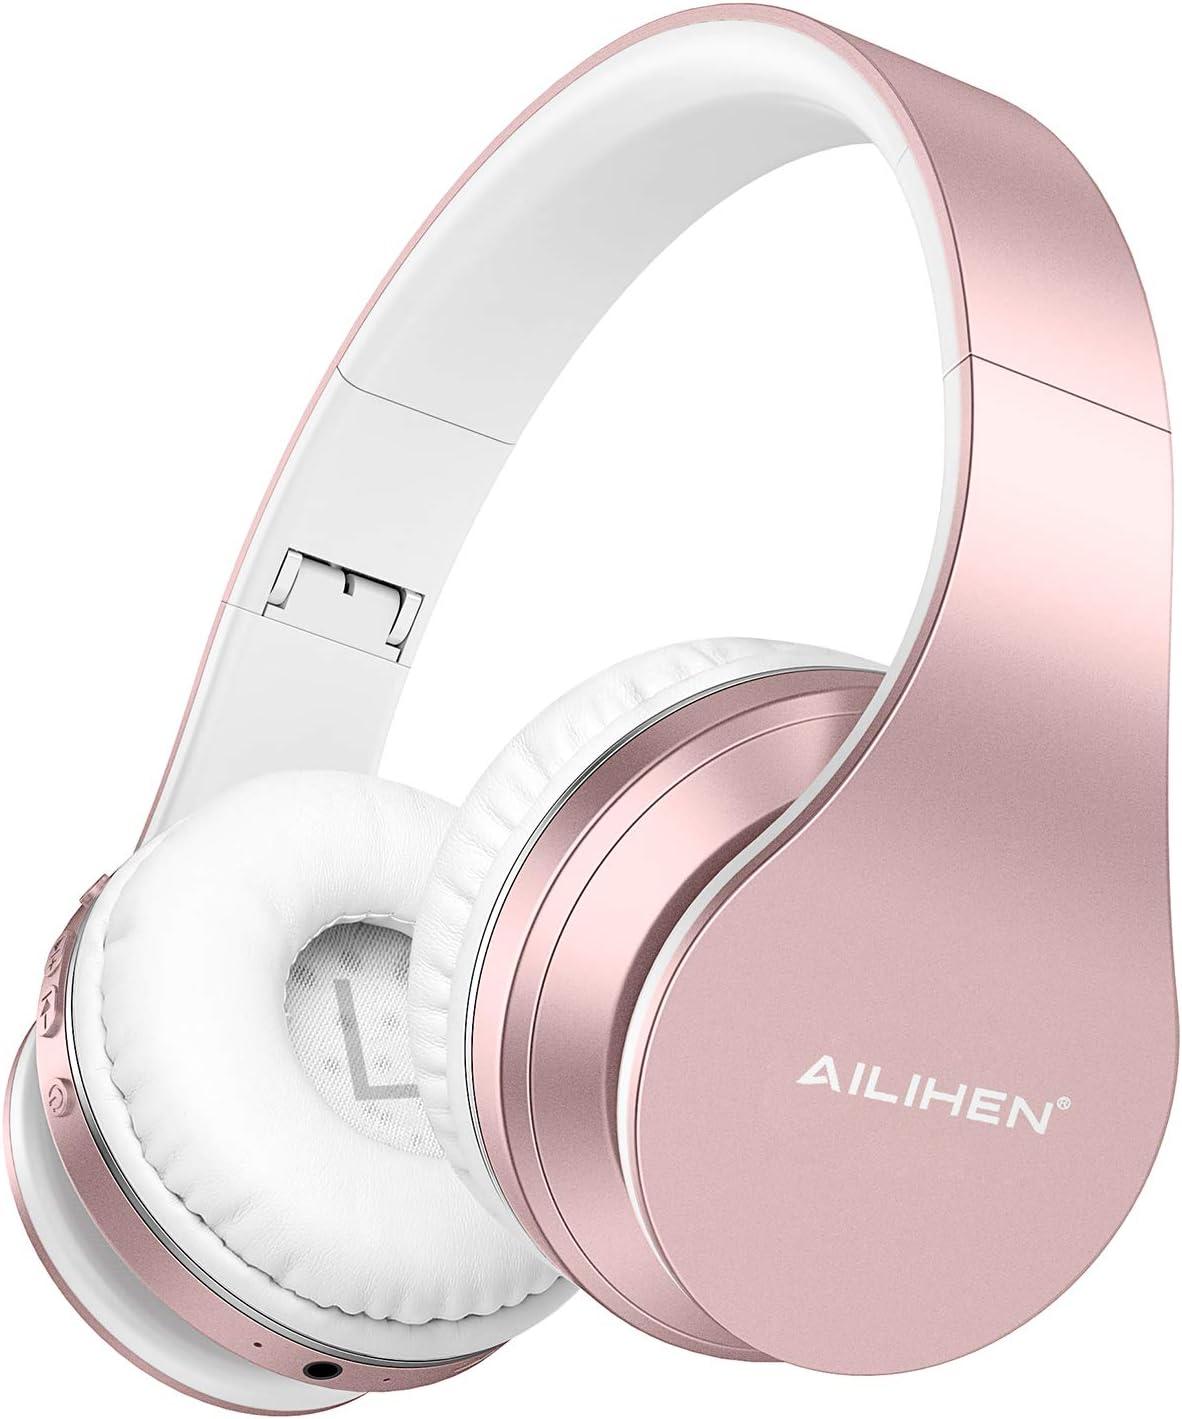 AILIHEN A80 Audífonos Inalámbricos Bluetooth 5.0 Plegables sobre Oreja con Micrófono Hi-Fi Estéreo, Soporte con Tarjeta TF, Modo MP3, 25H Tiempo de Reproducción para PC Teléfono Móvil - Oro Rosa